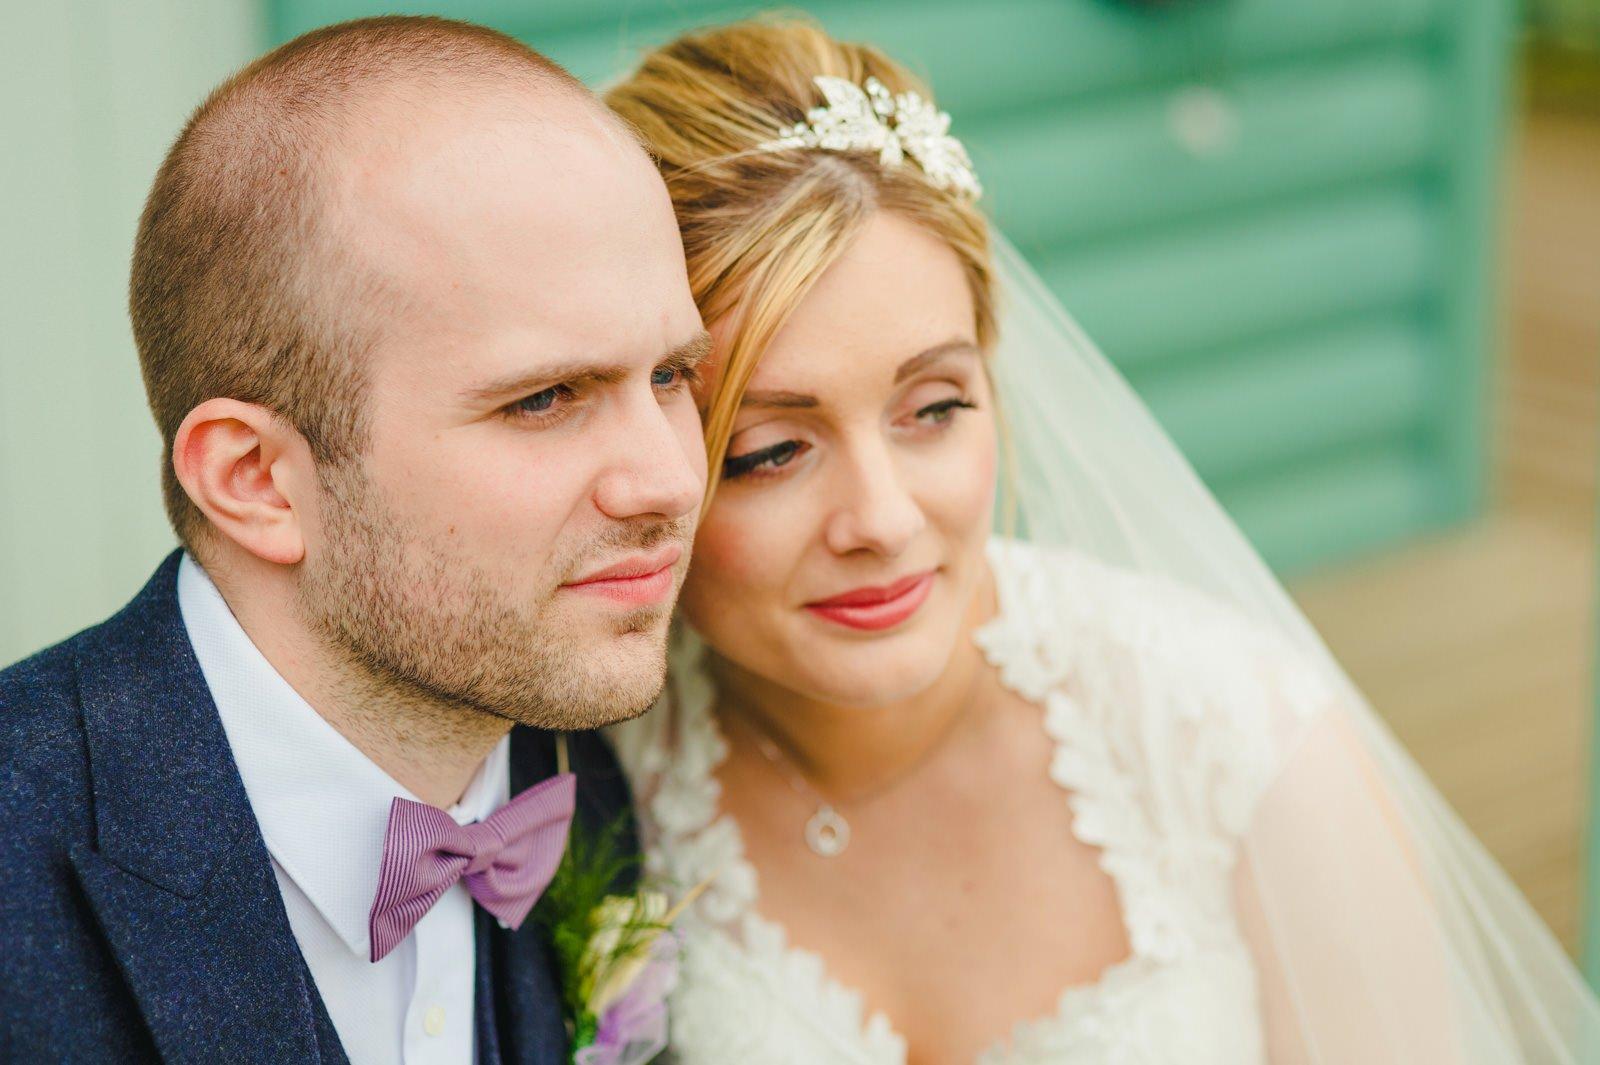 Millers Of Netley wedding, Dorrington, Shrewsbury | Emma + Ben 70